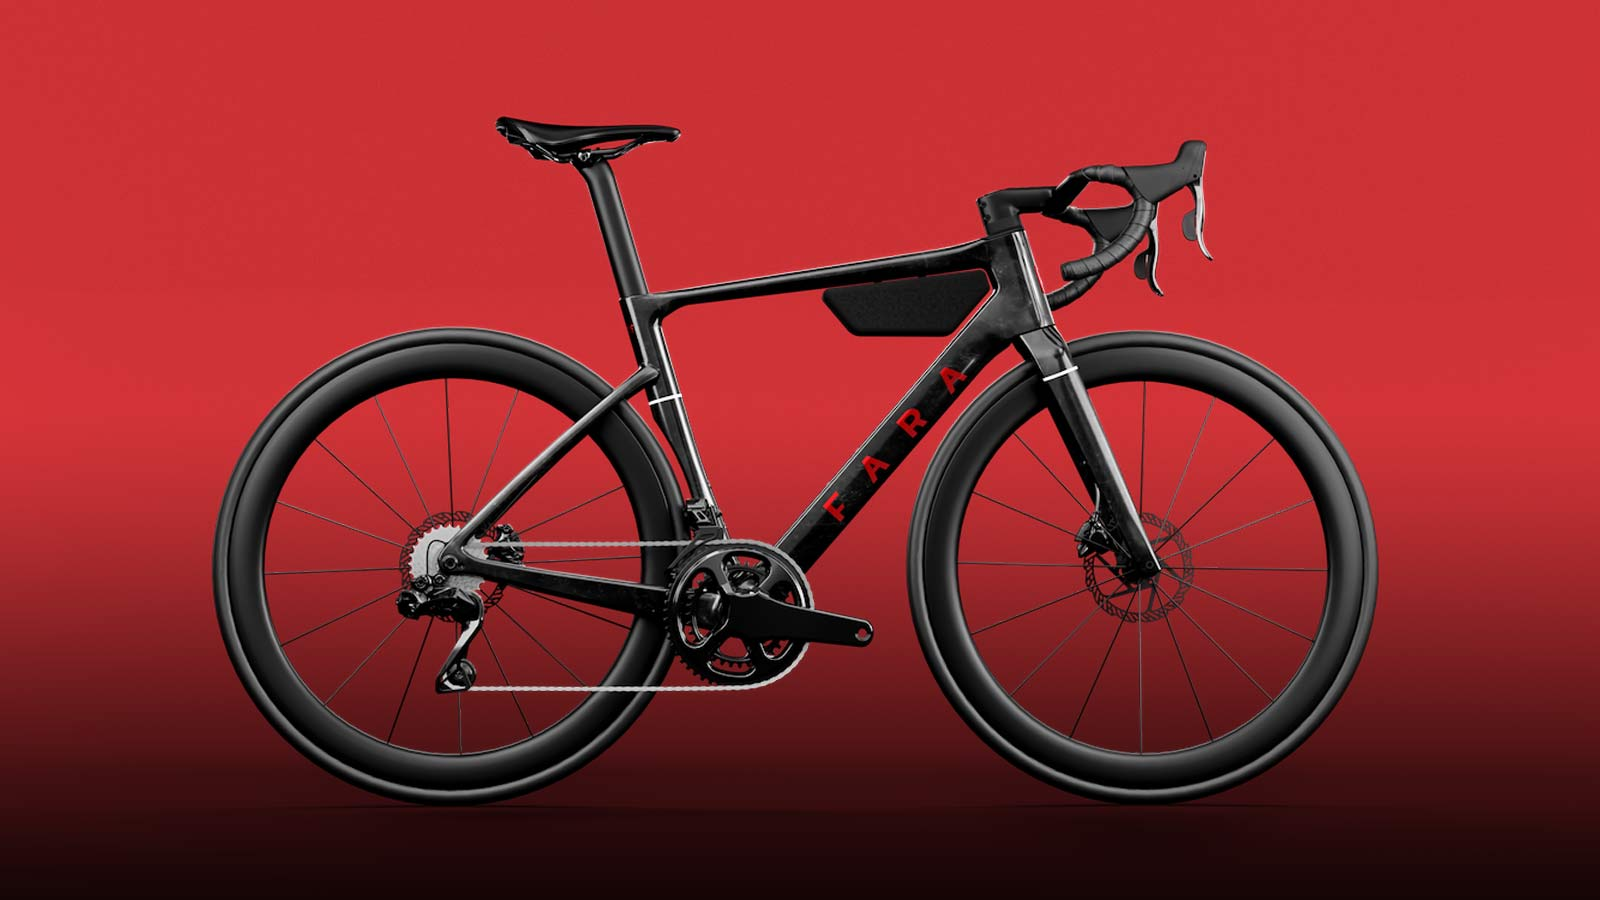 Fara F/RD aero carbon endurance adventure all-road bike,red